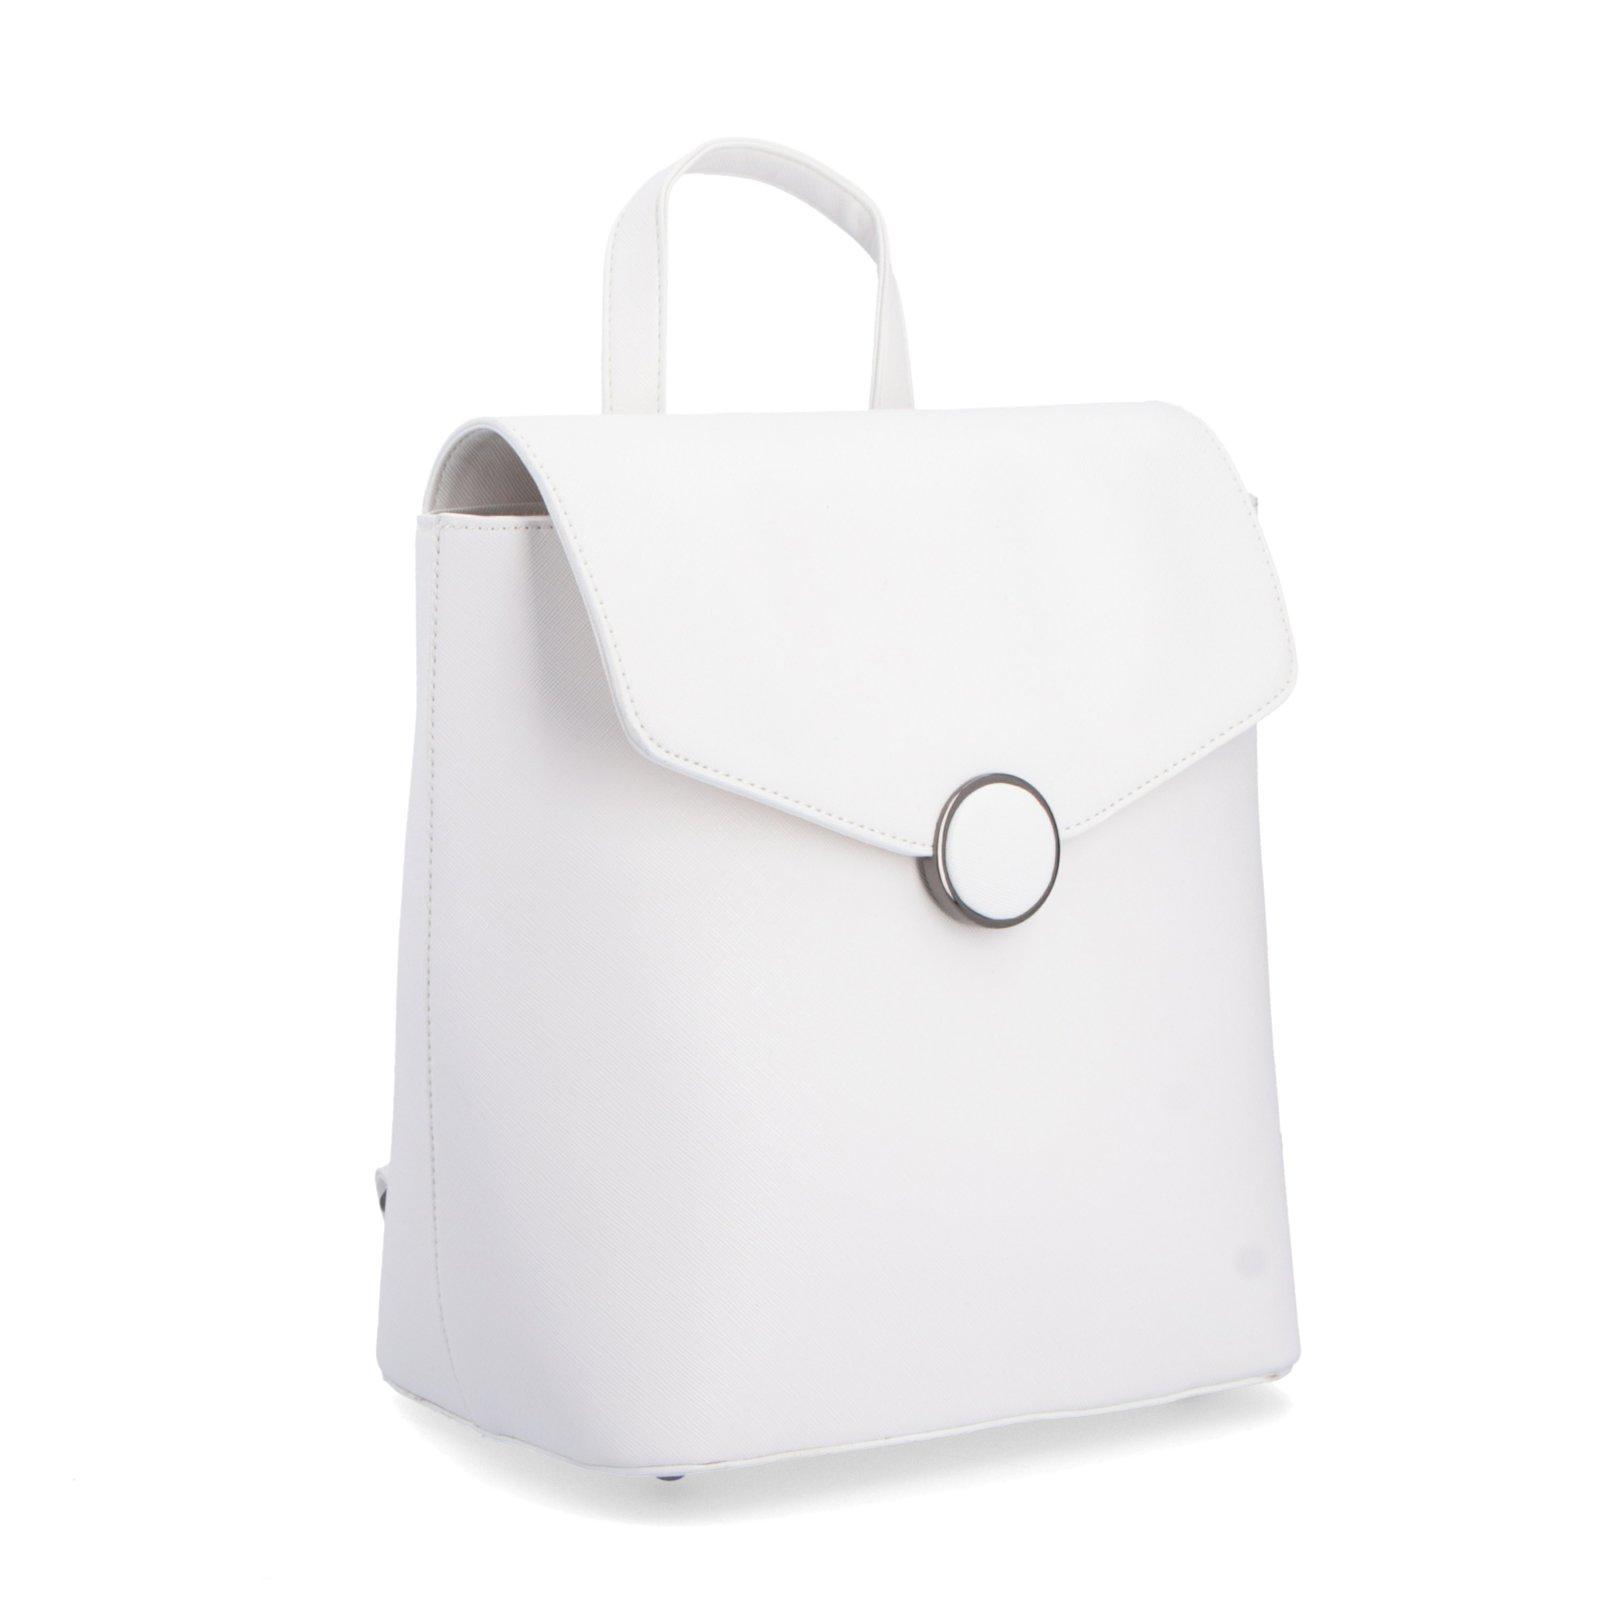 Elegantní batoh Le Sands – 3838 B